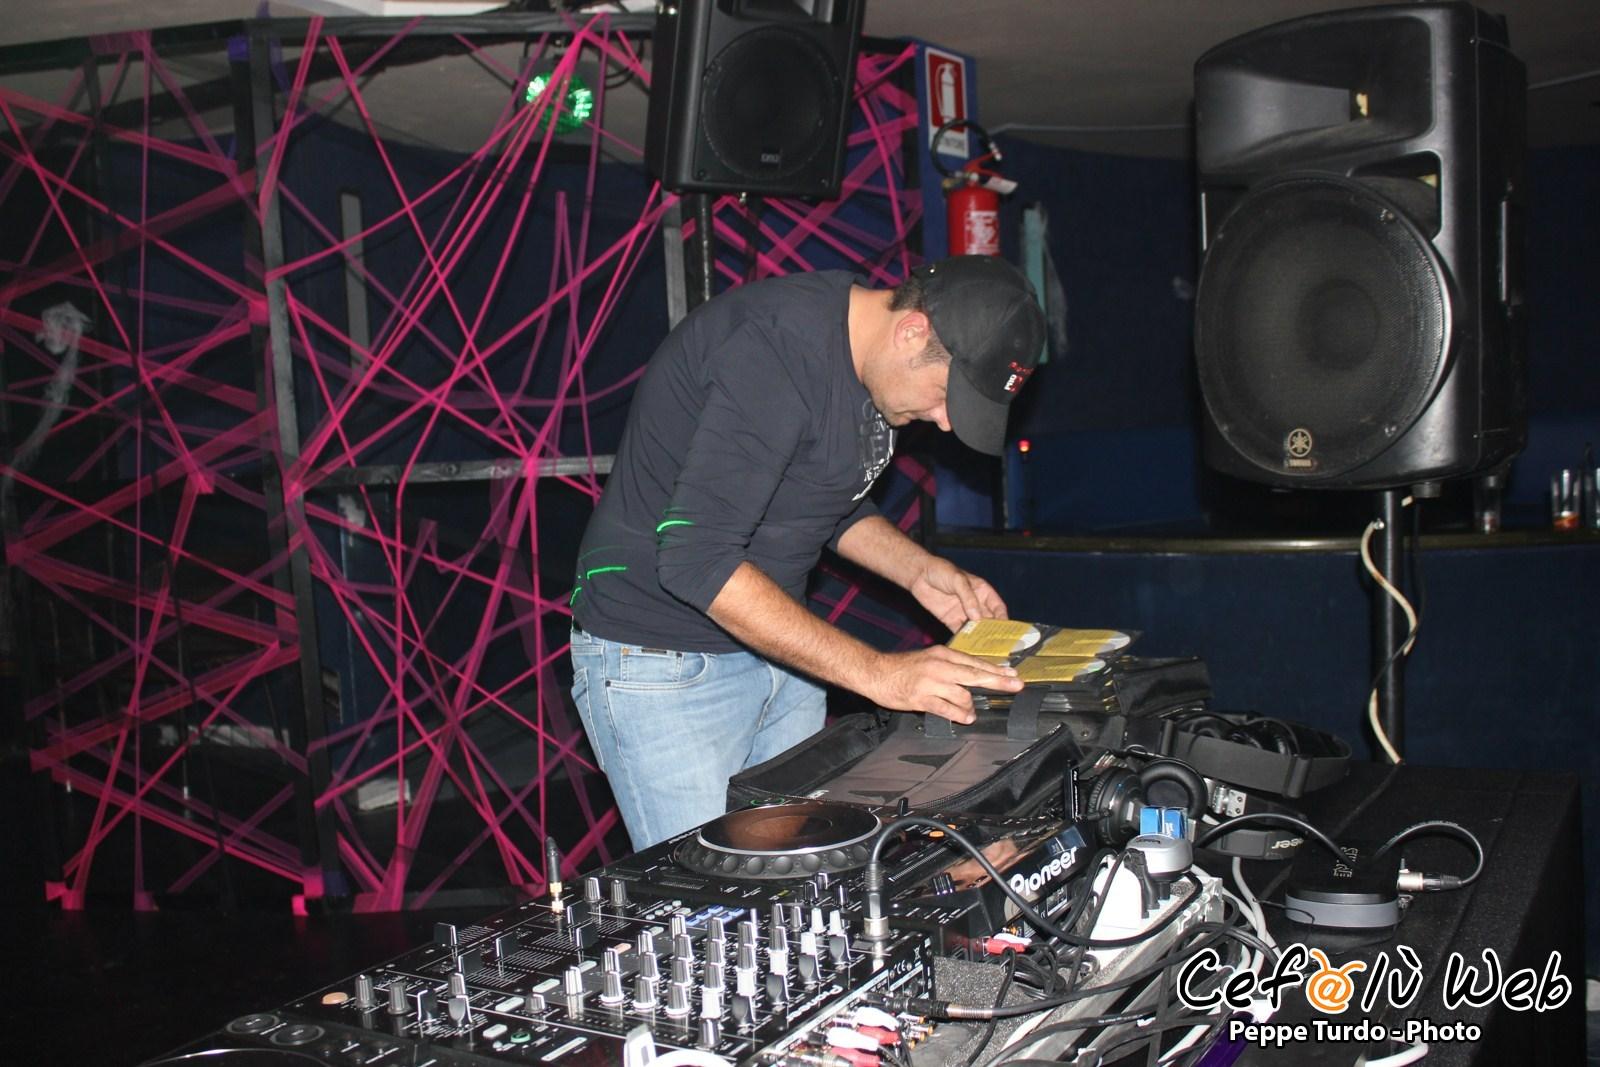 Discoteca Carlton Riviera: 31 Ottobre 2012 [Foto]